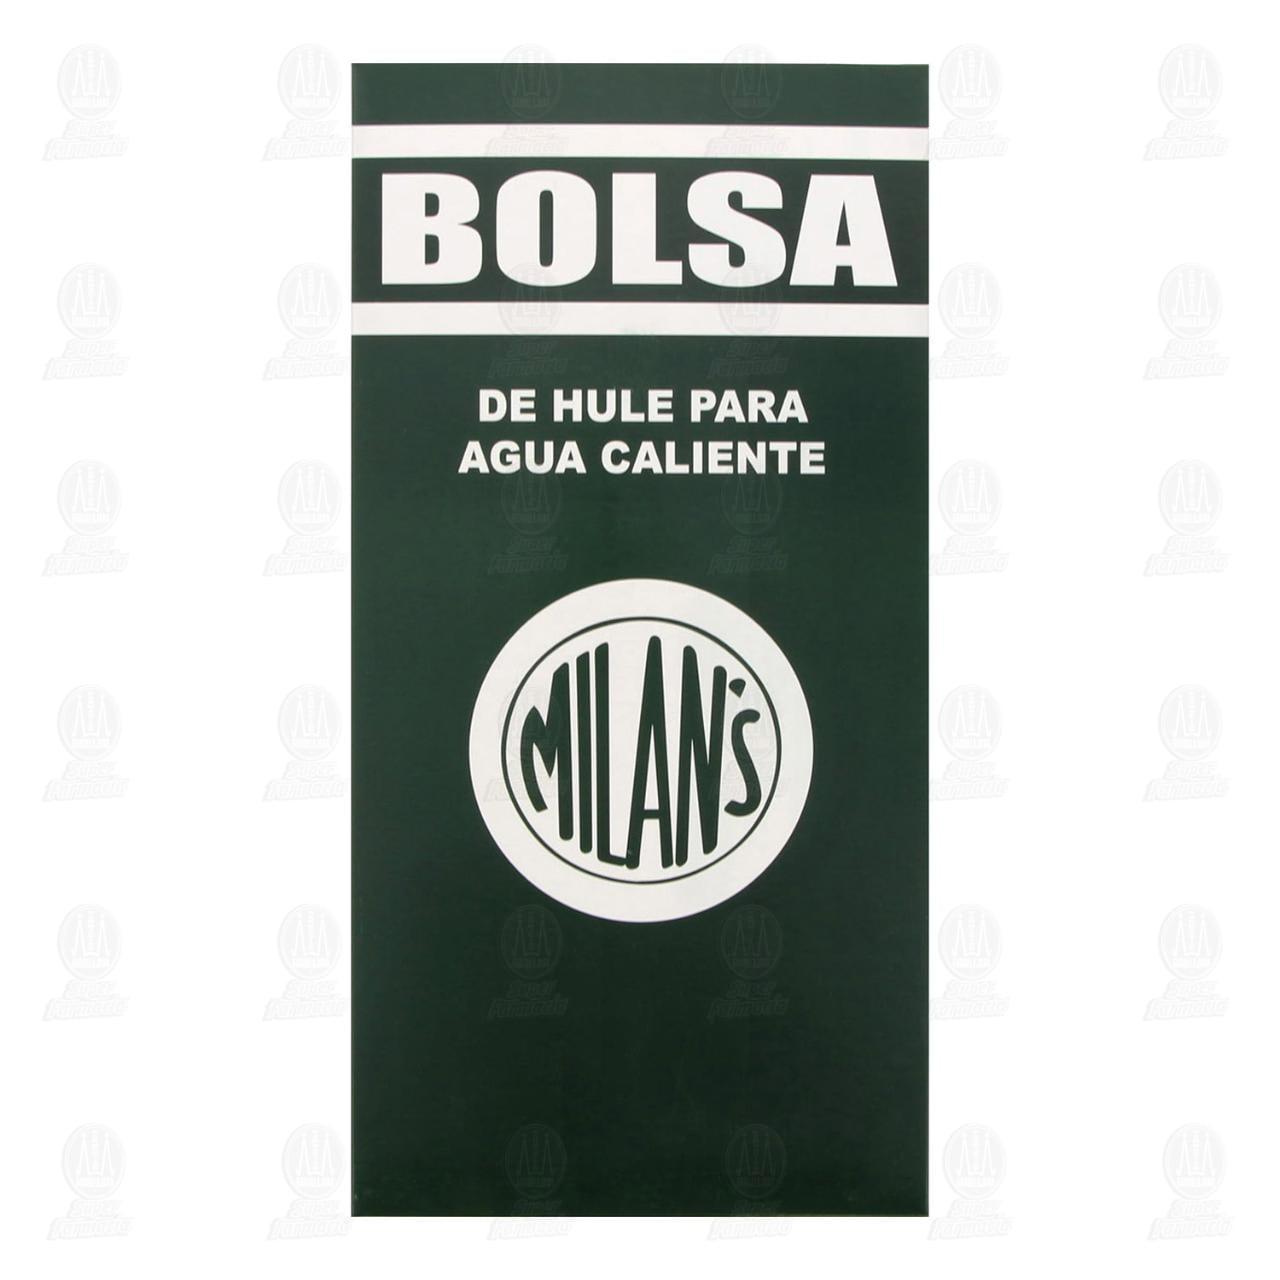 Comprar Bolsa de Hule Milan's para Agua Caliente en Farmacias Guadalajara